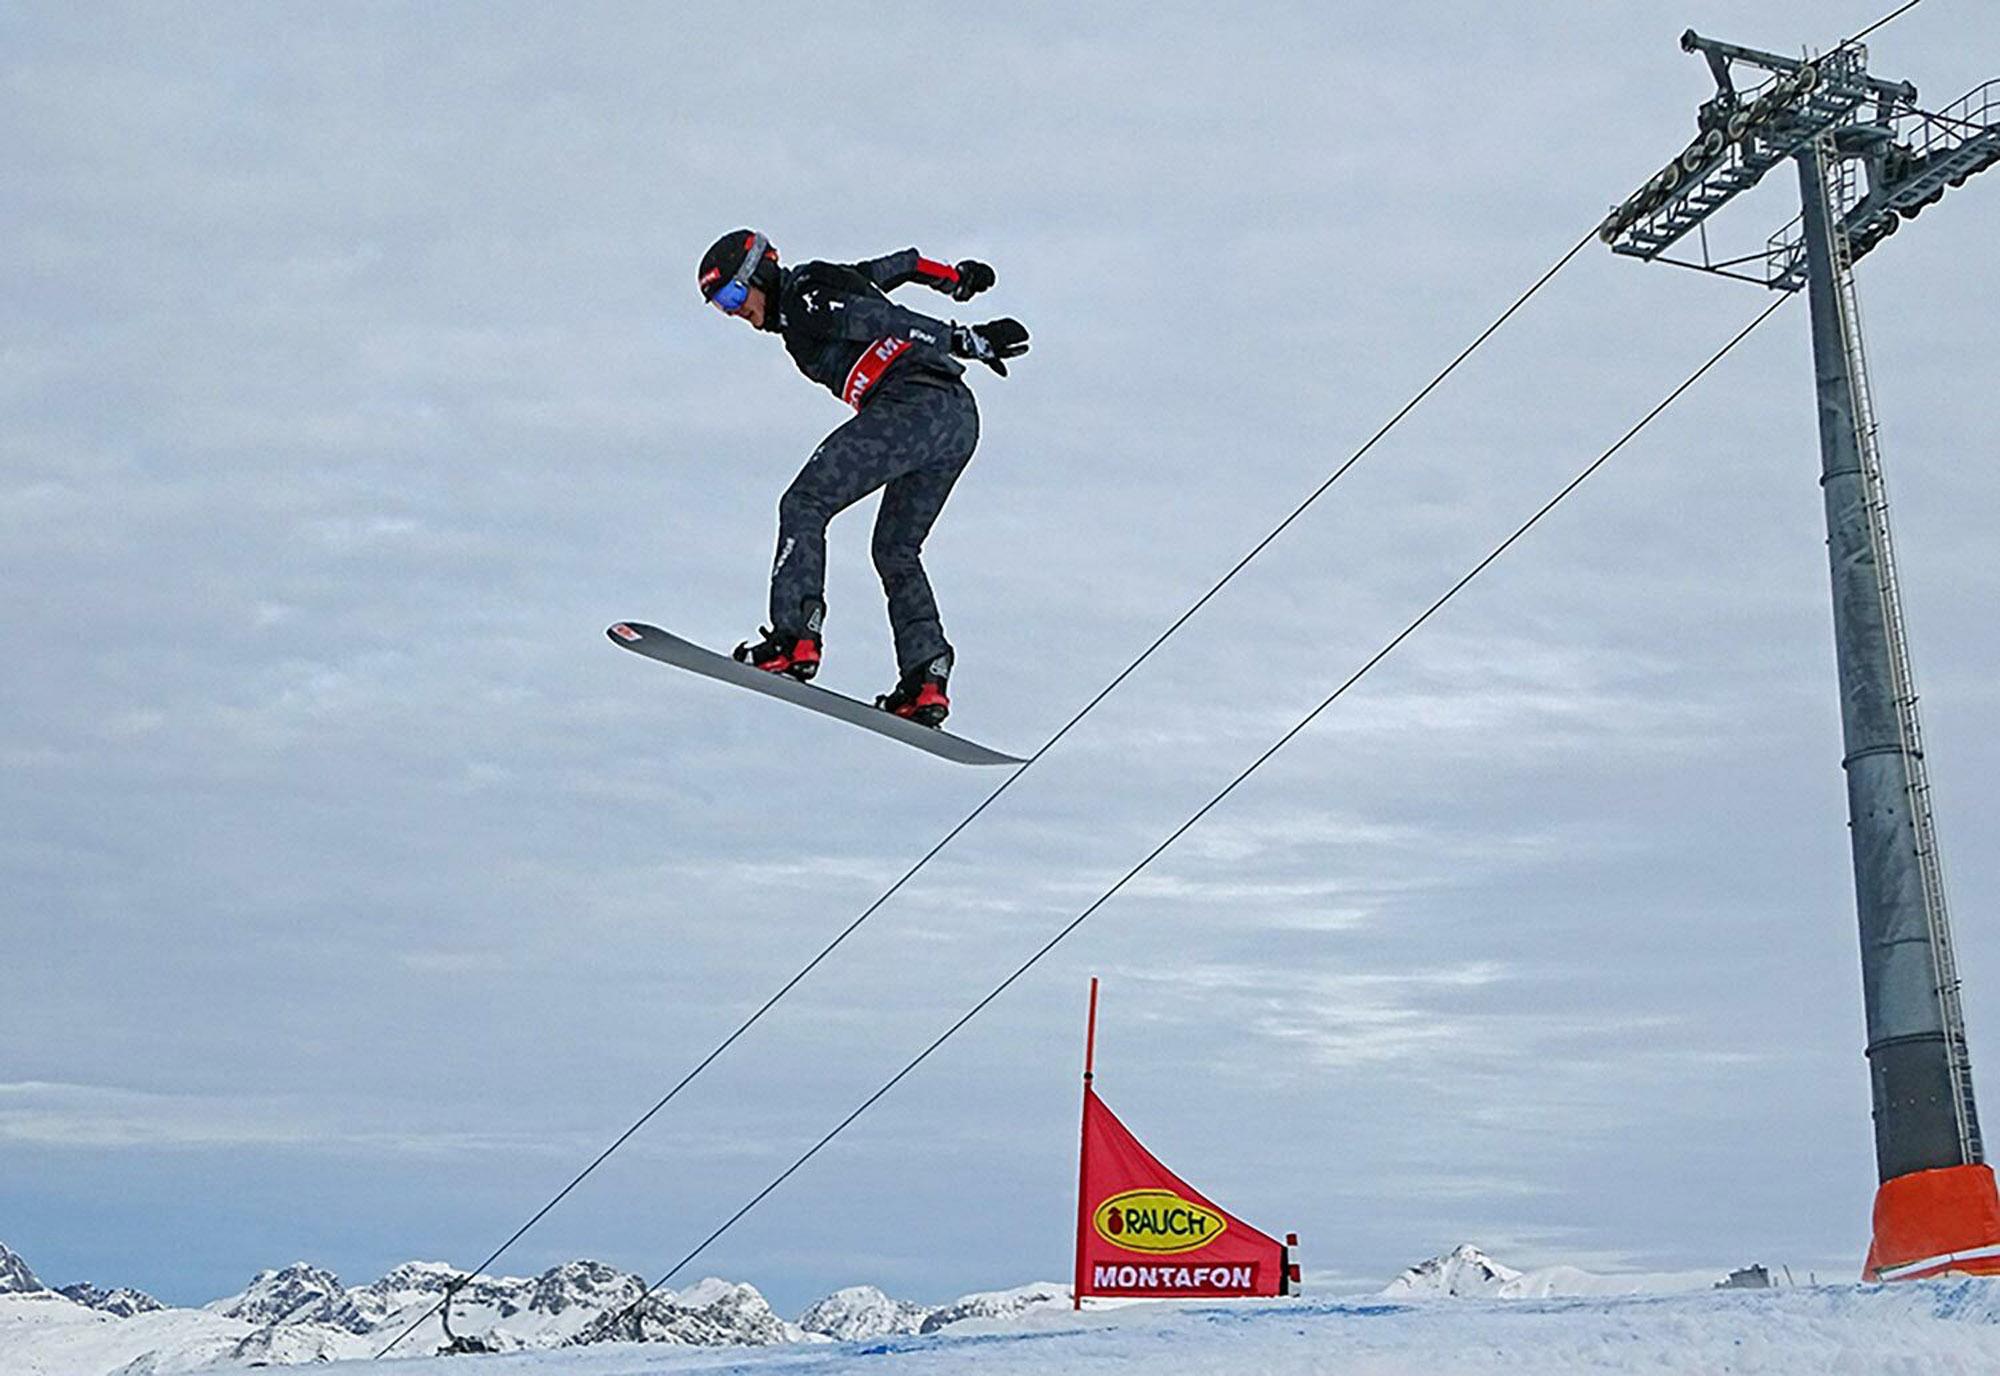 Snowboard Haemmerle Alessandro